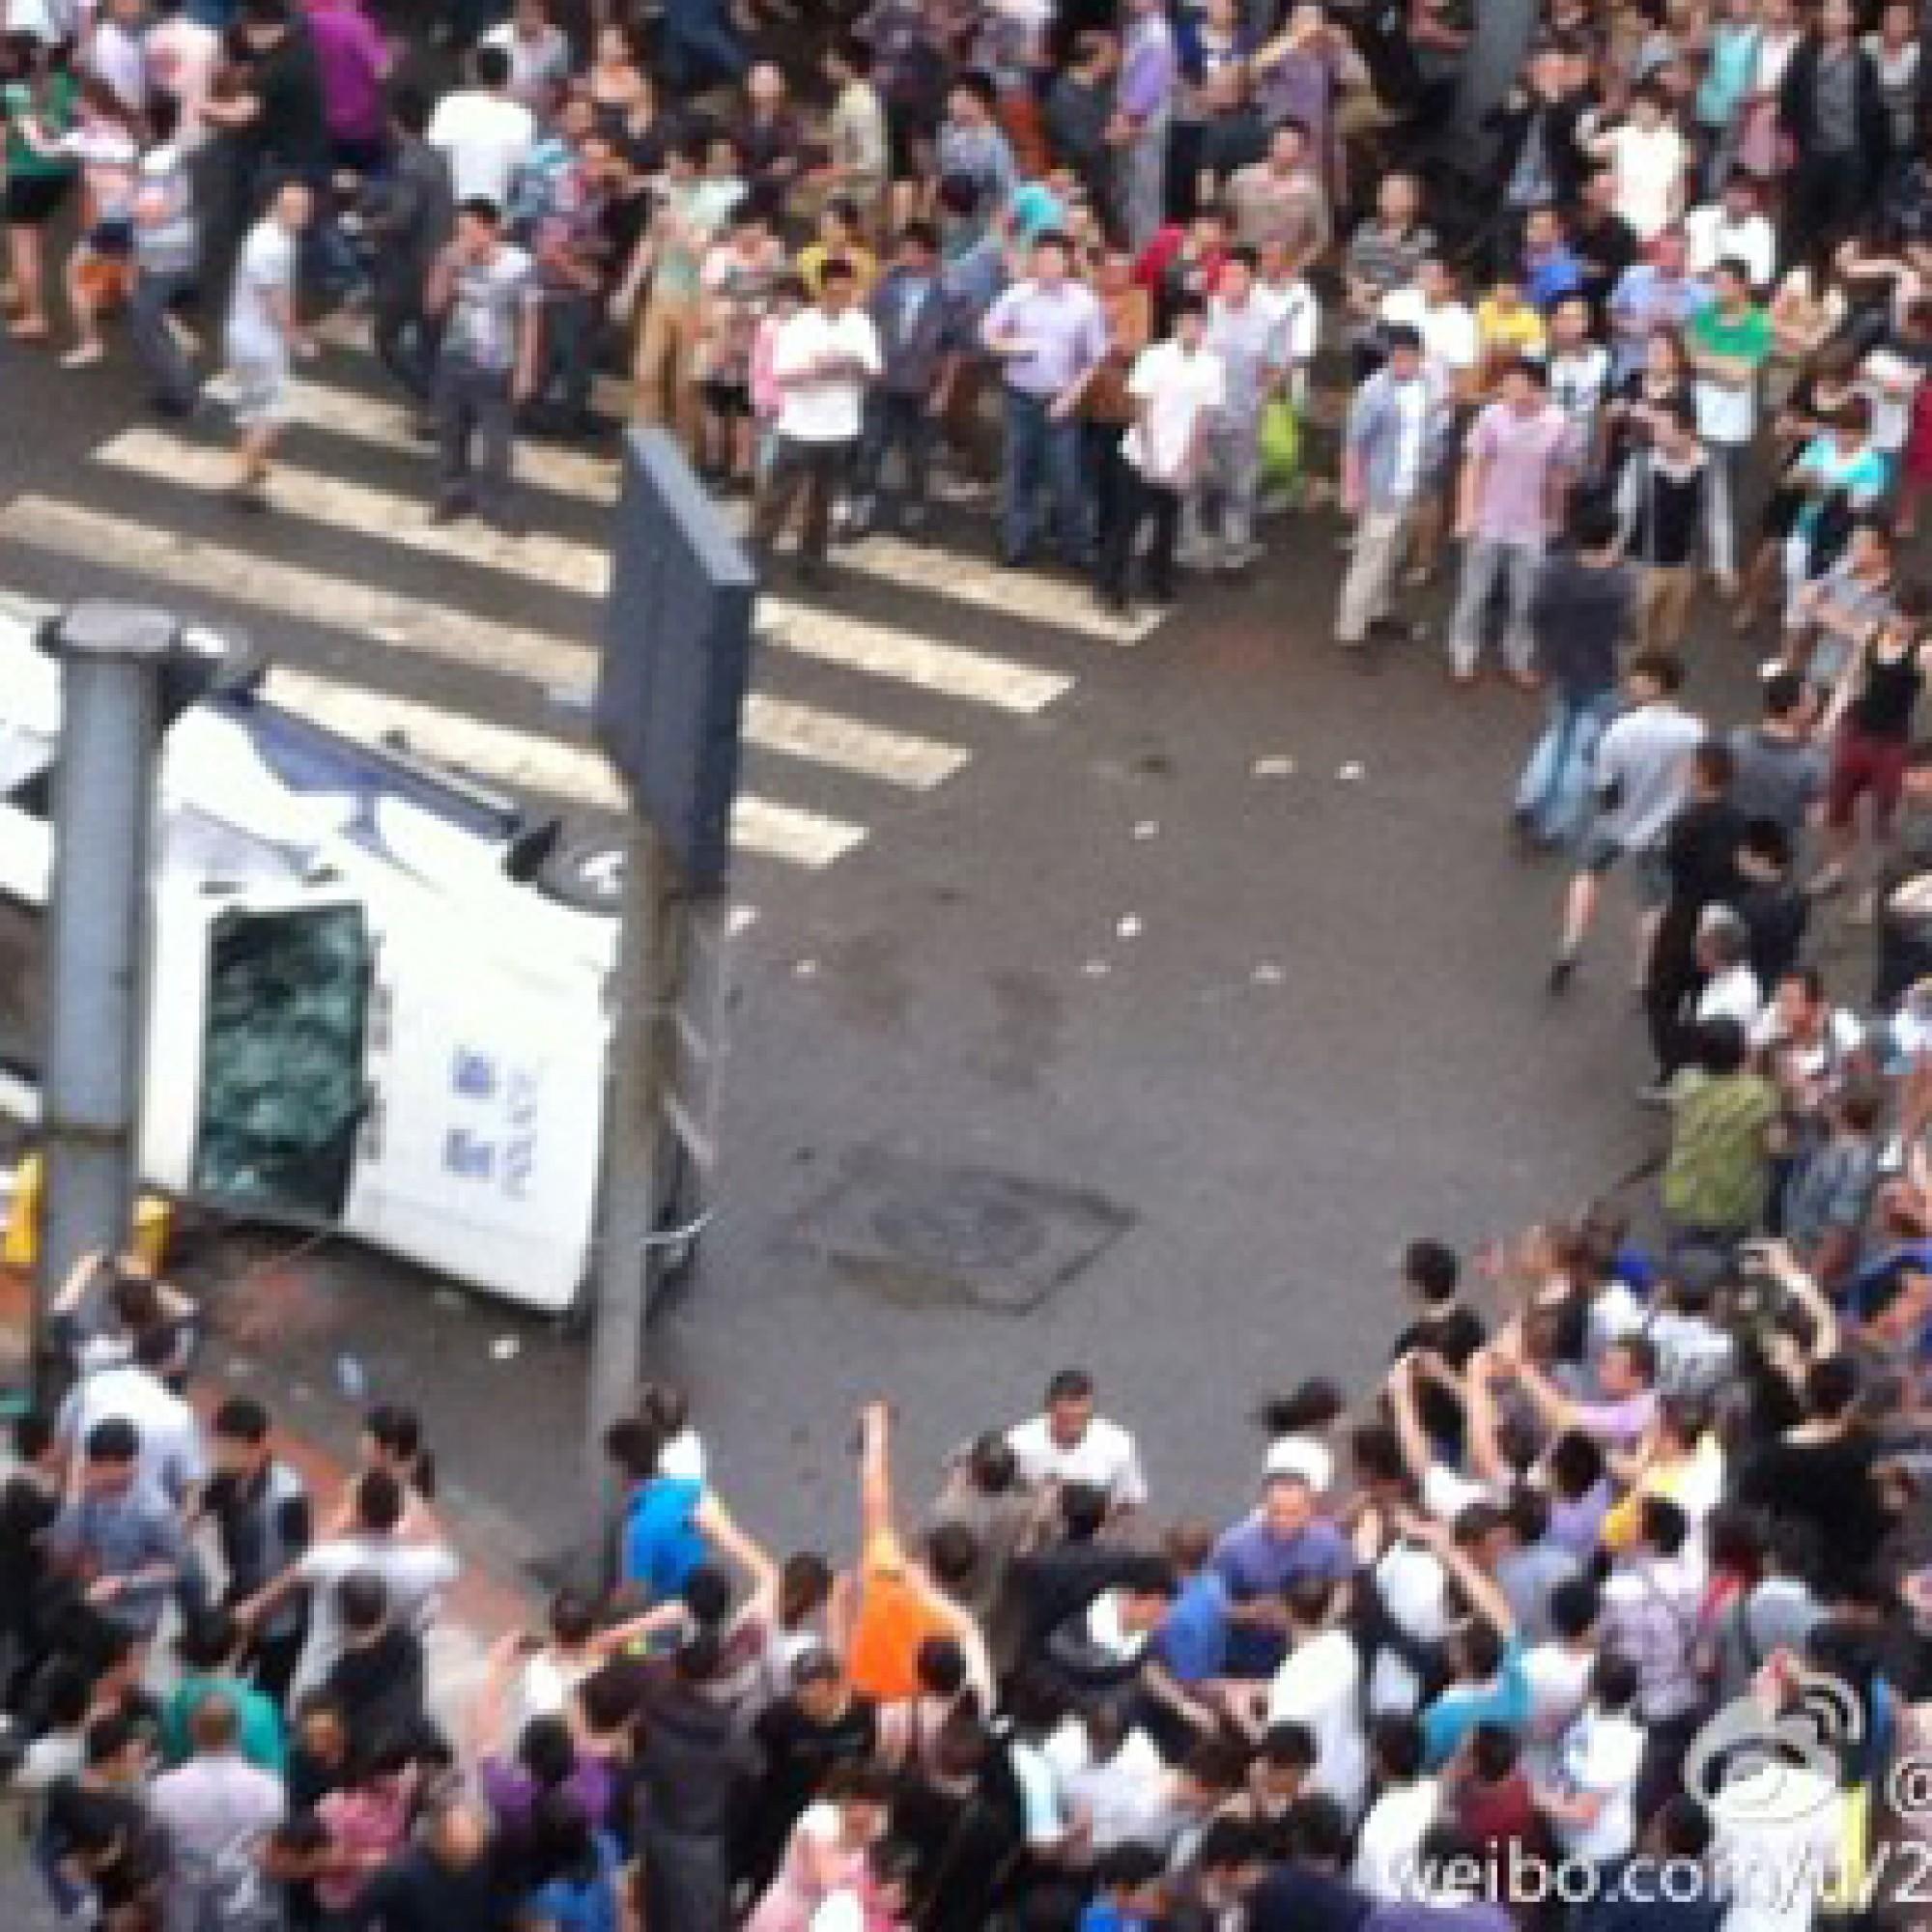 Bild: weibo.com